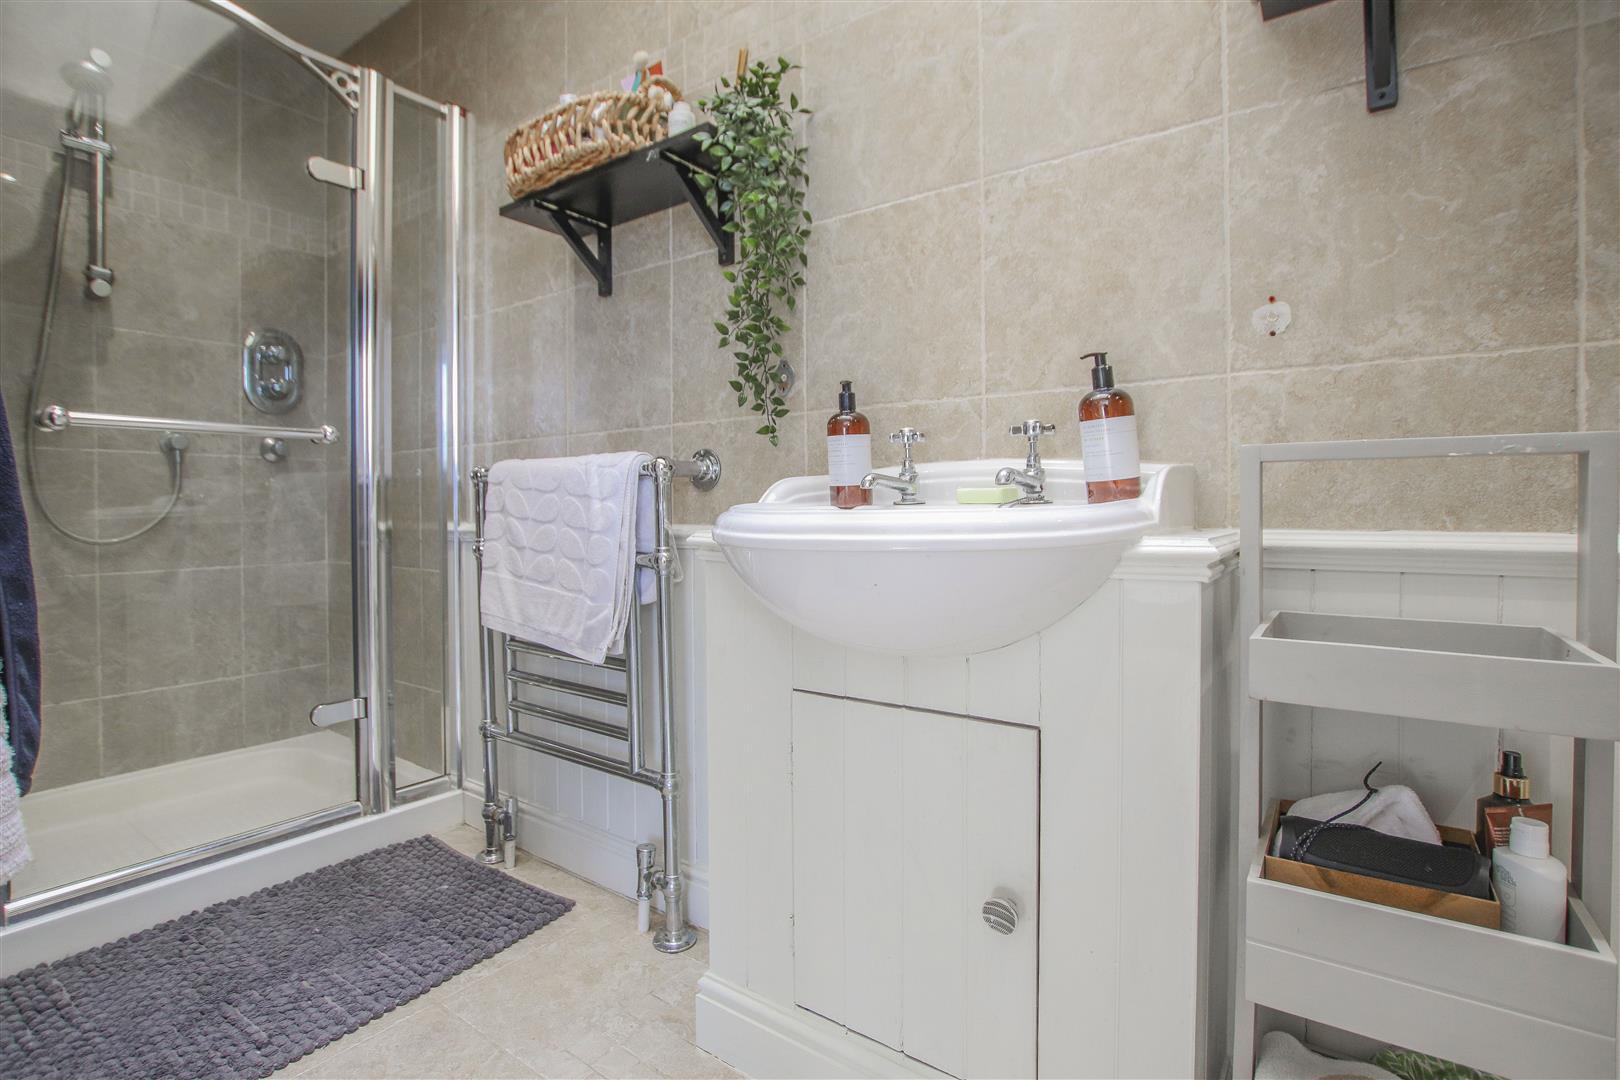 6 Bedroom Barn Conversion For Sale - 15.JPG